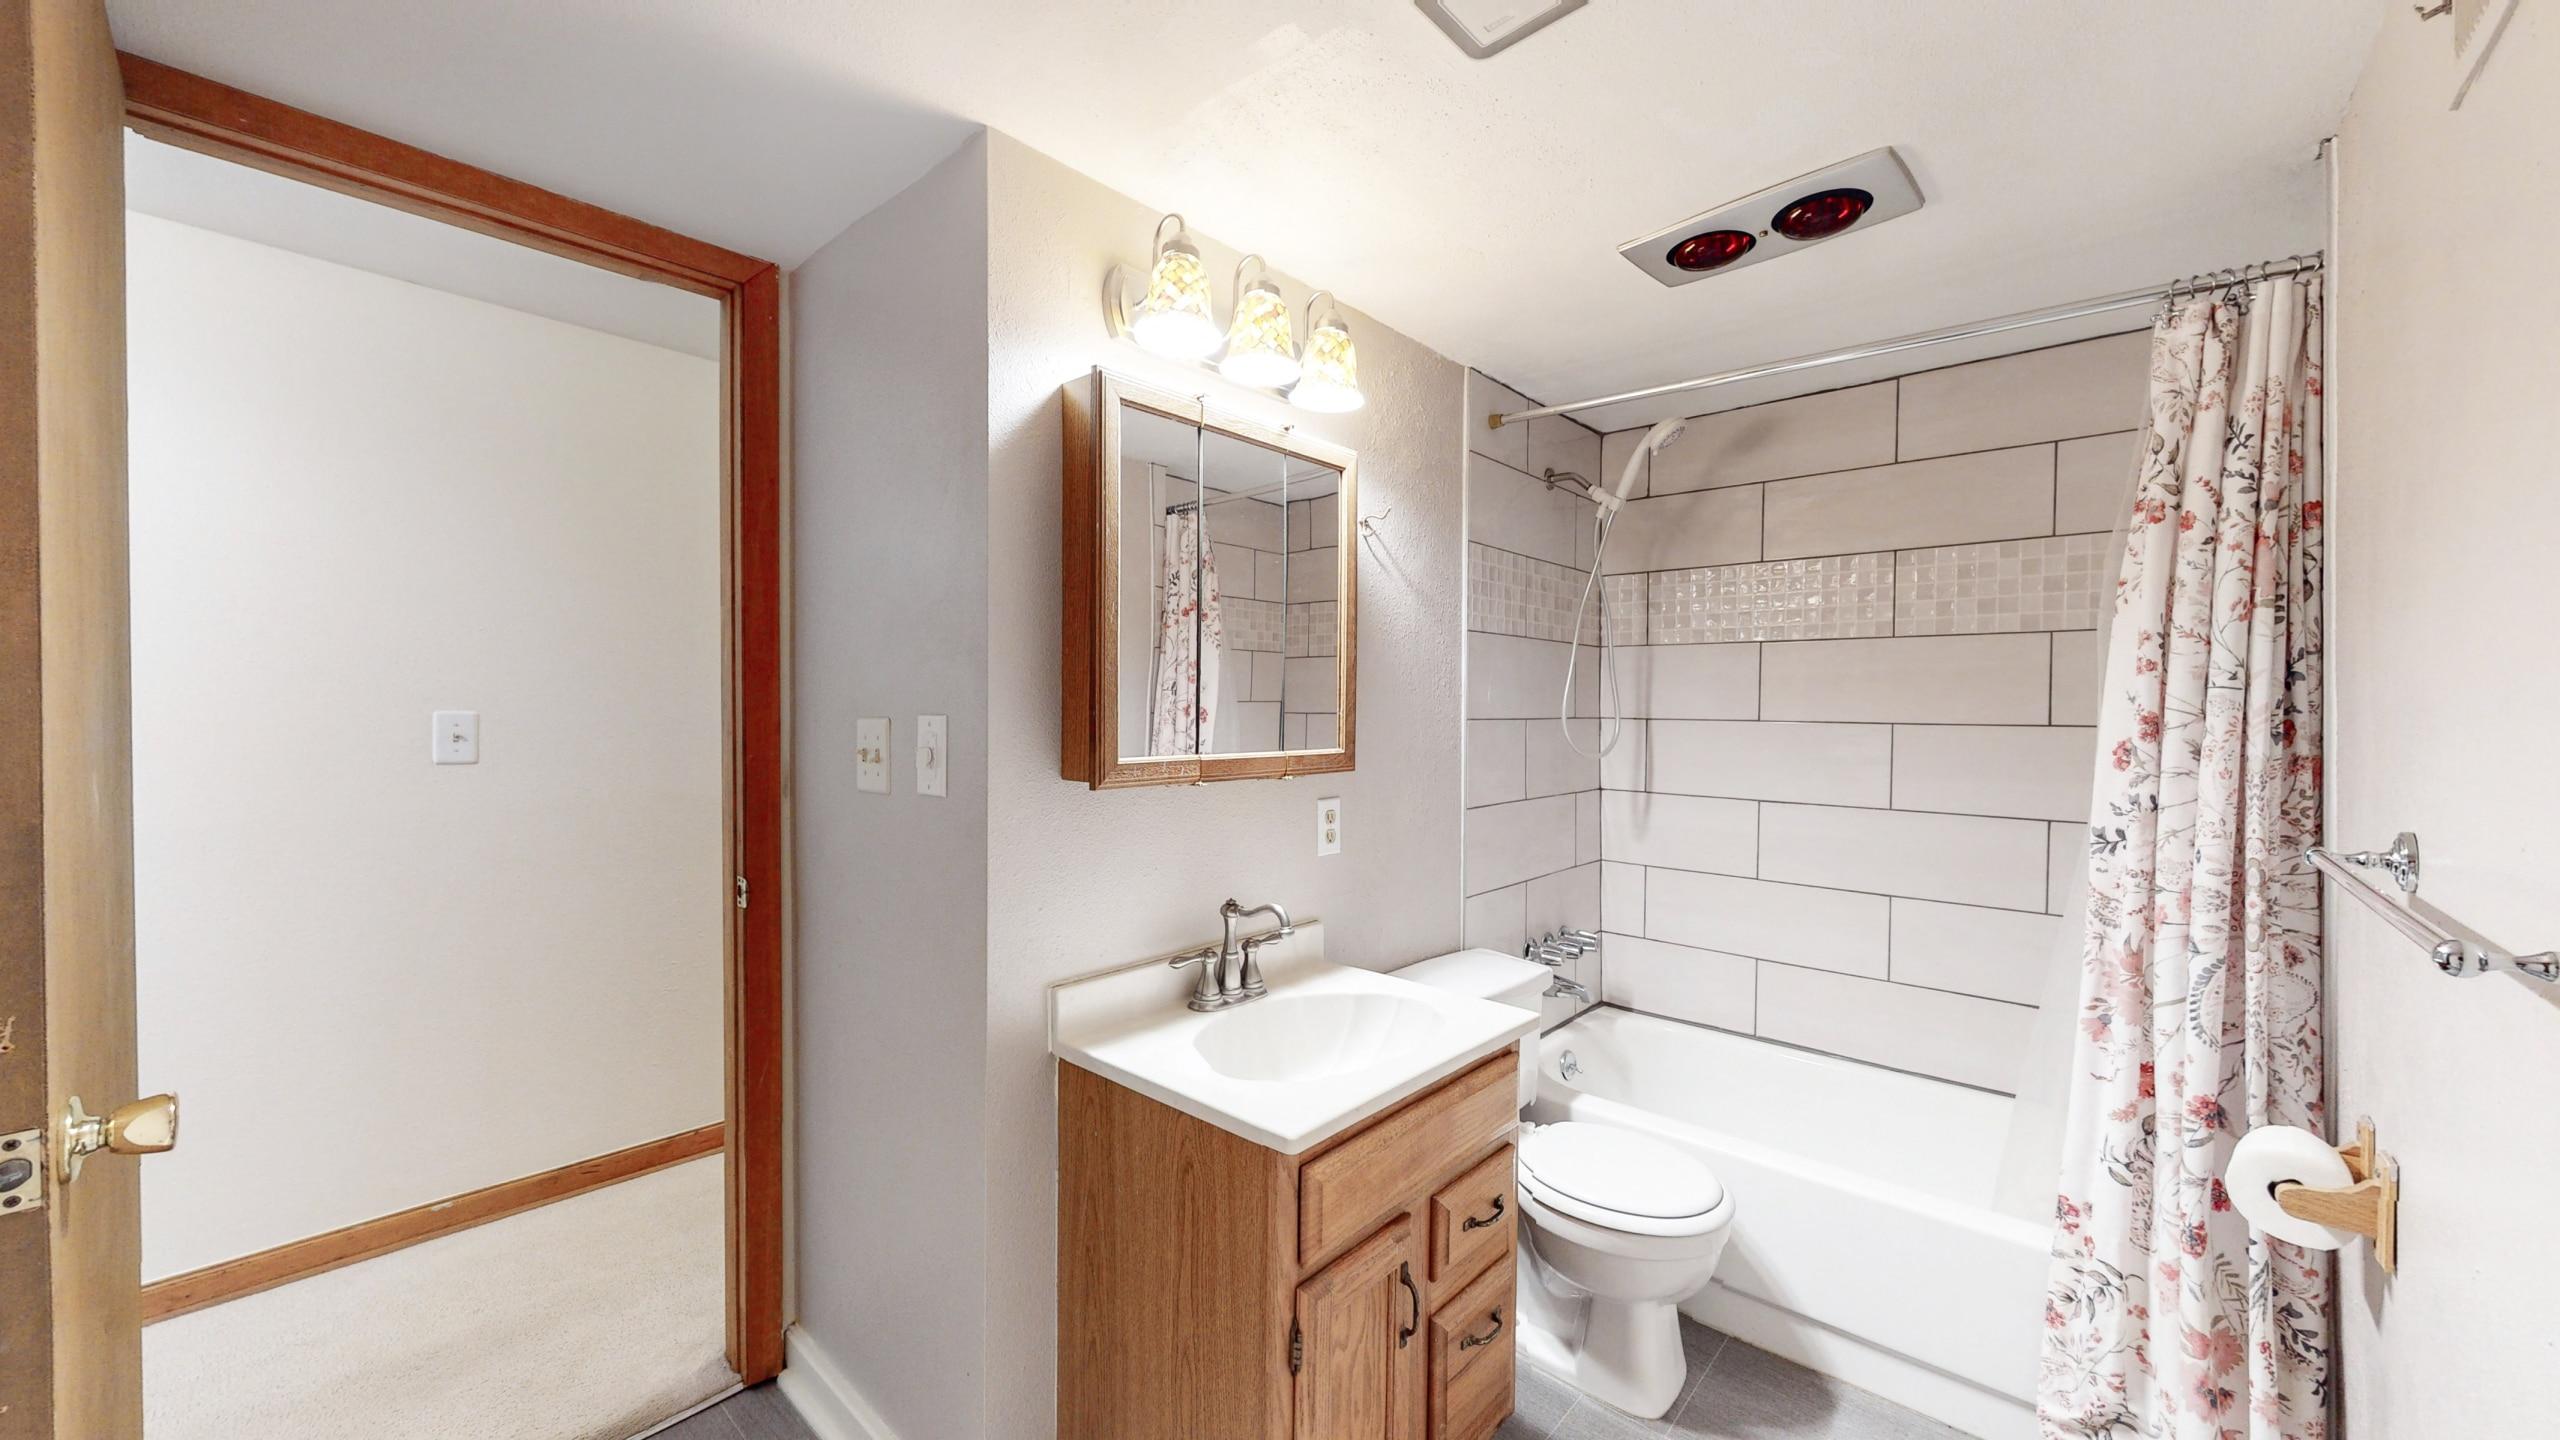 Brighton home for sale, basement bathroom, updated, nice white designer tile in shower